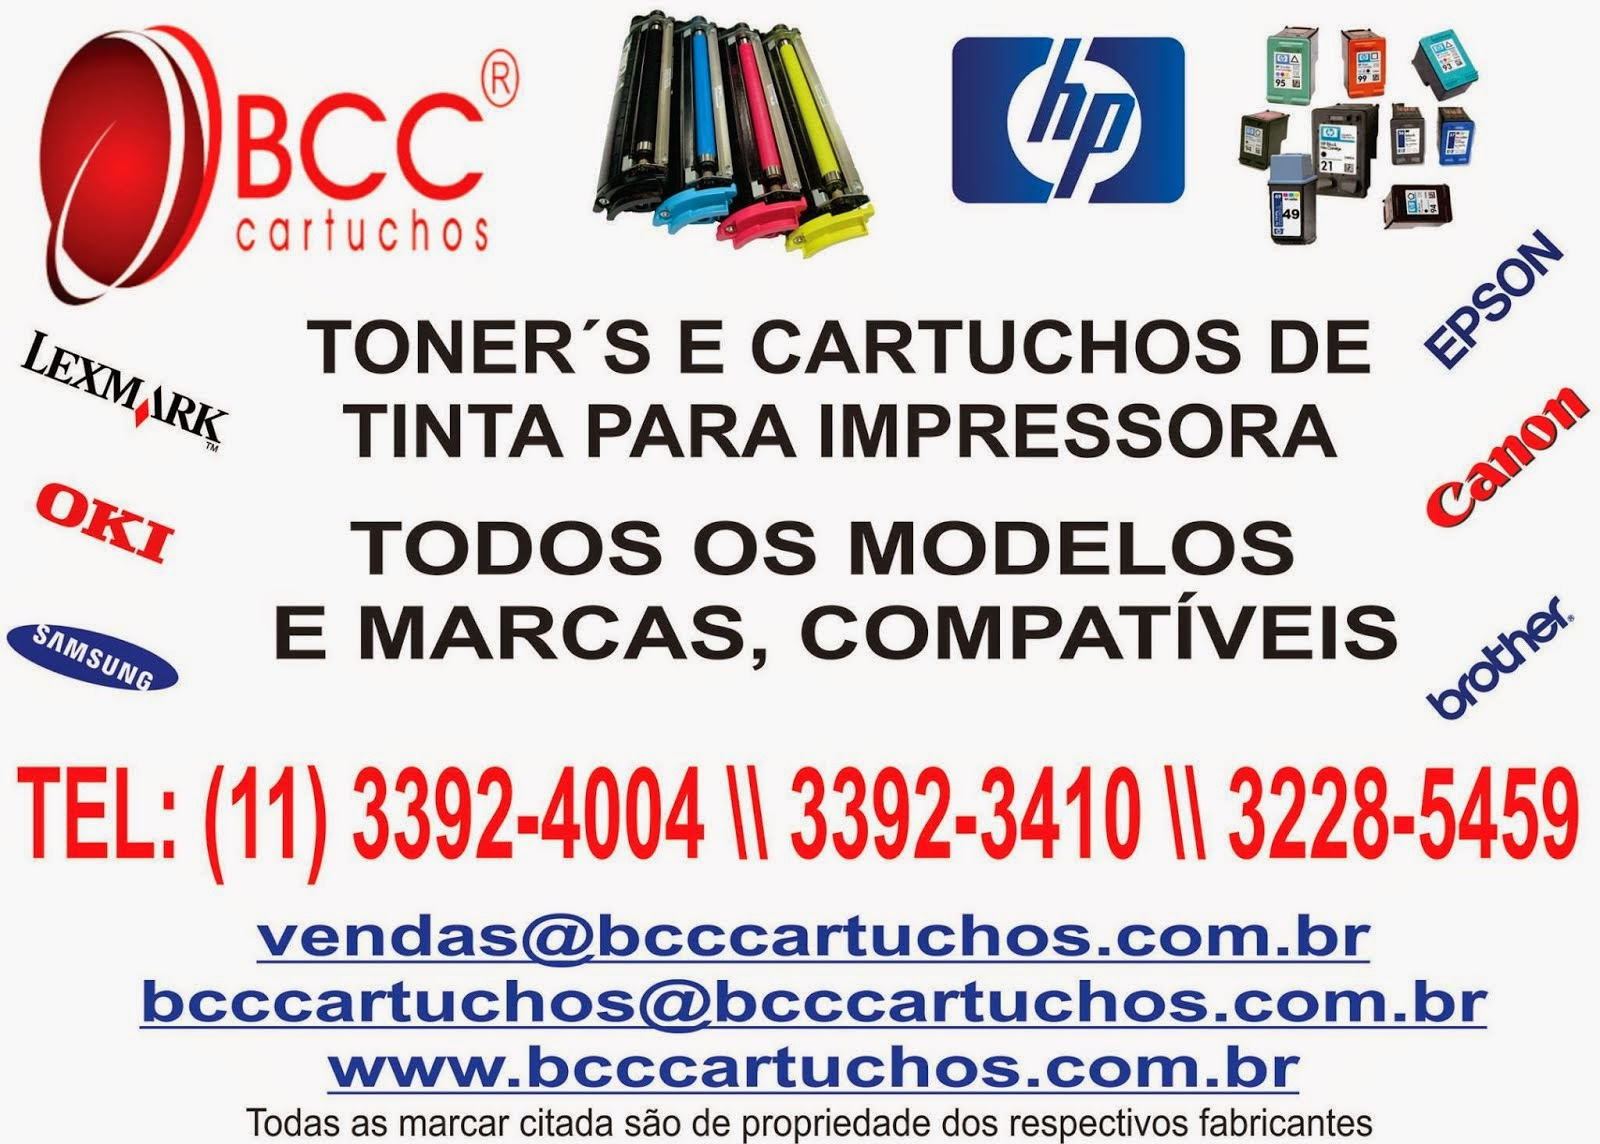 Compre aqui BCC CARTUCHOS